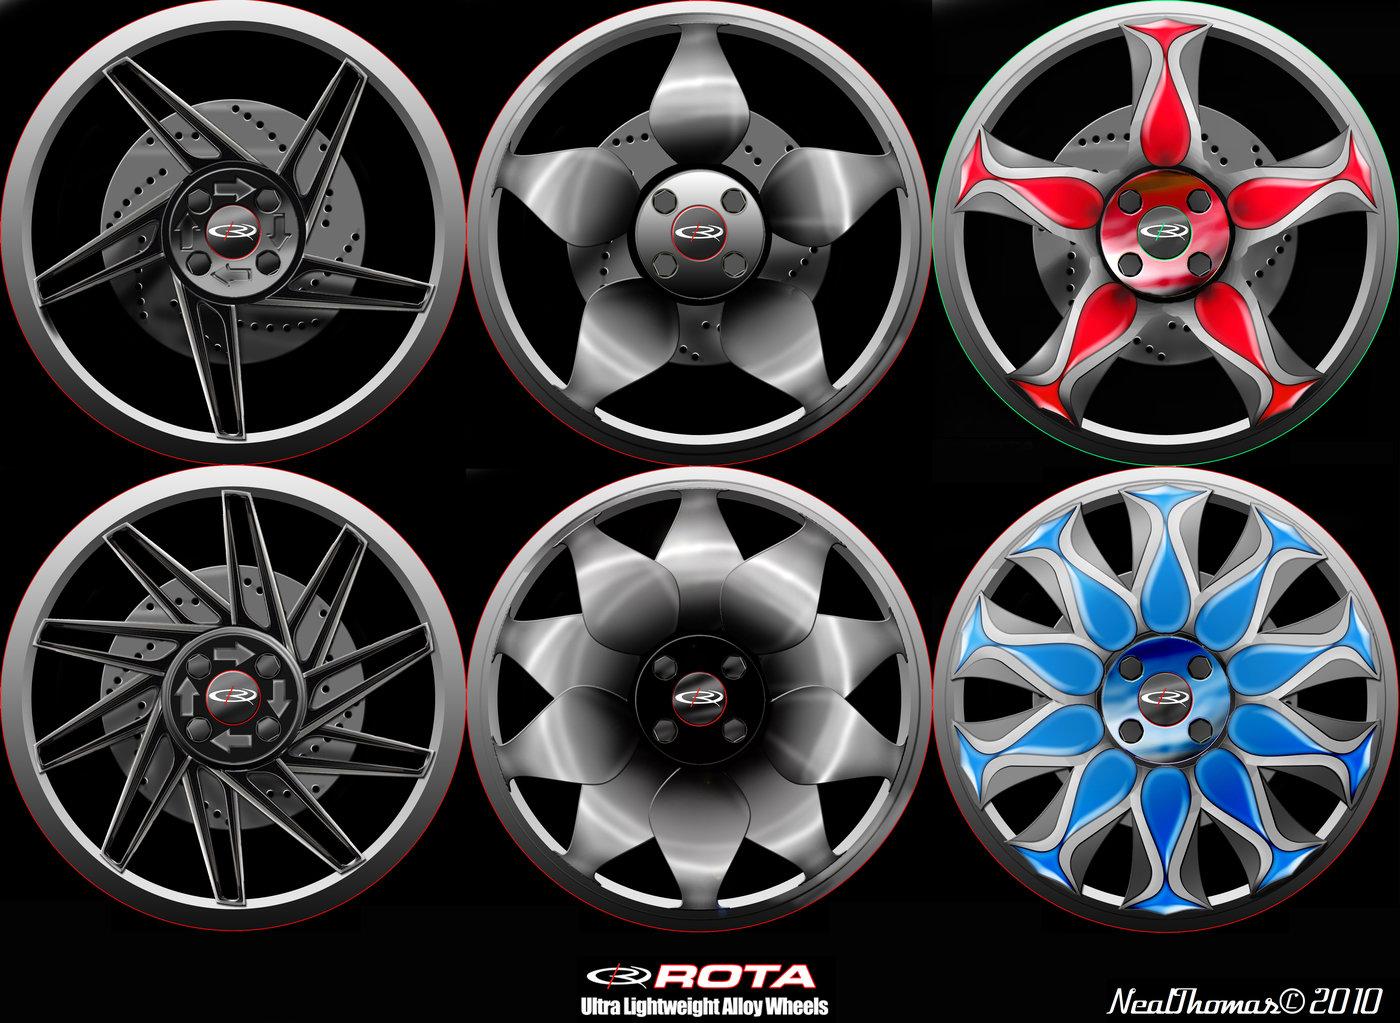 Rota Alloy Wheel Design by Neal Thomas at Coroflot.com